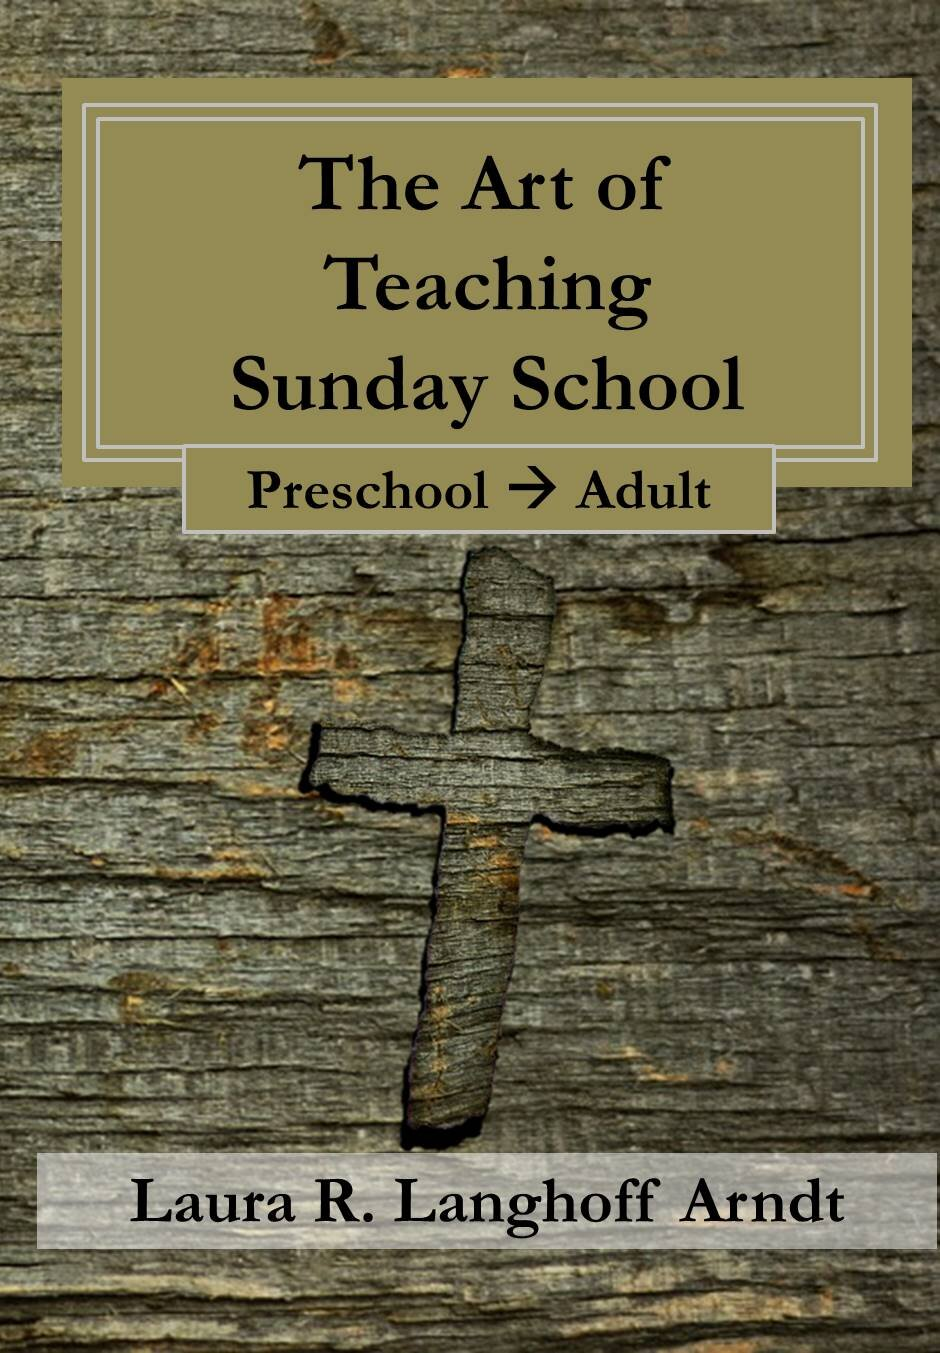 The Art of Teaching Sunday School by Laura Langhoff Arndt.jpg